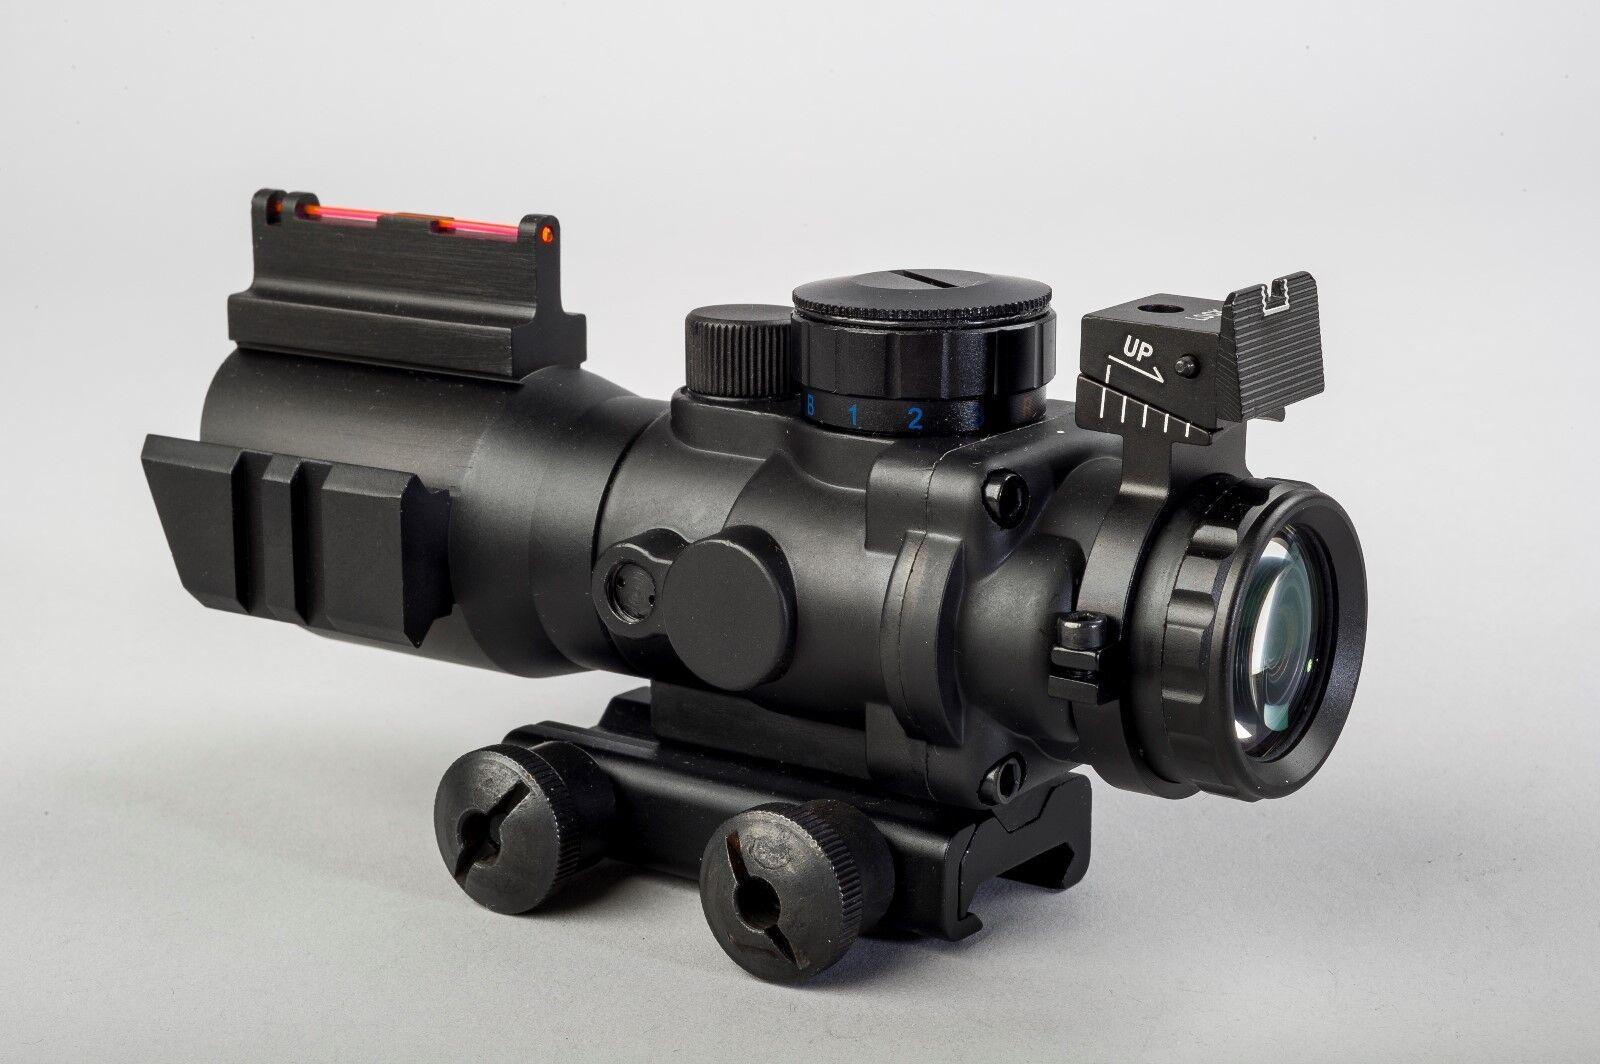 Ra- 4 x 32 Tri-Lume™ Prismáticos Mil-Dot ultracompacto 'ACOG' Mira